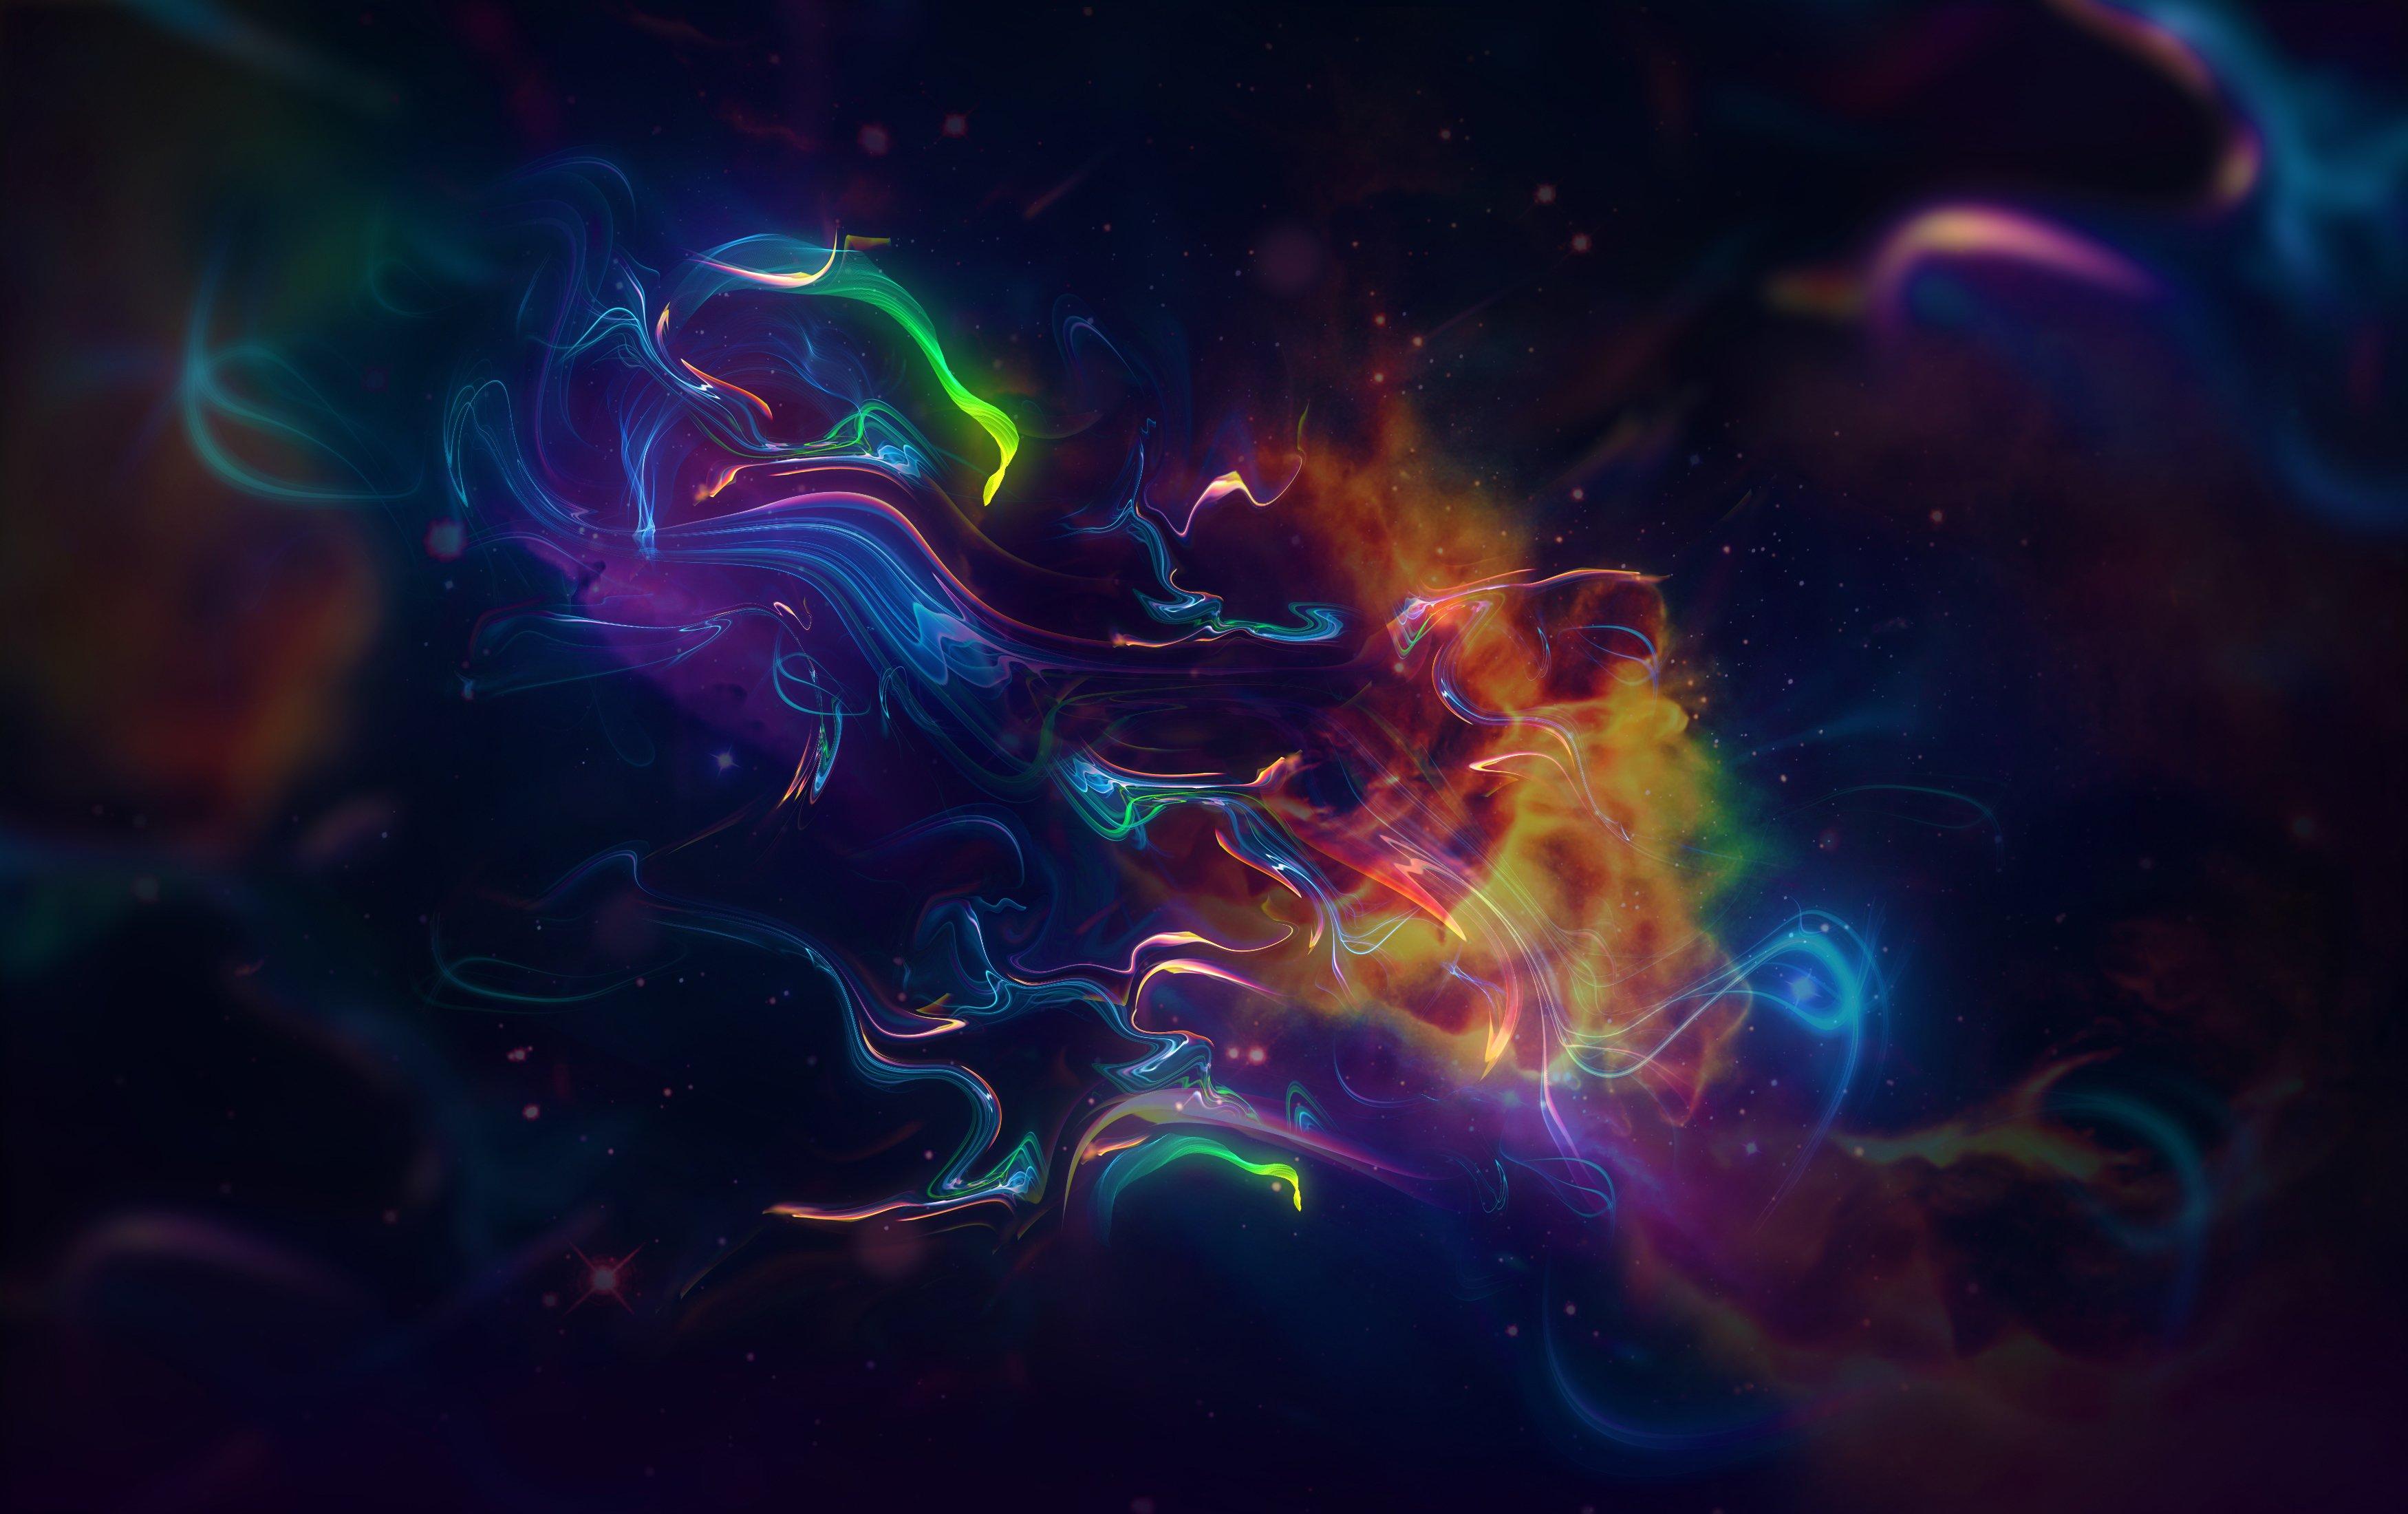 Wallpaper Nebula space colors